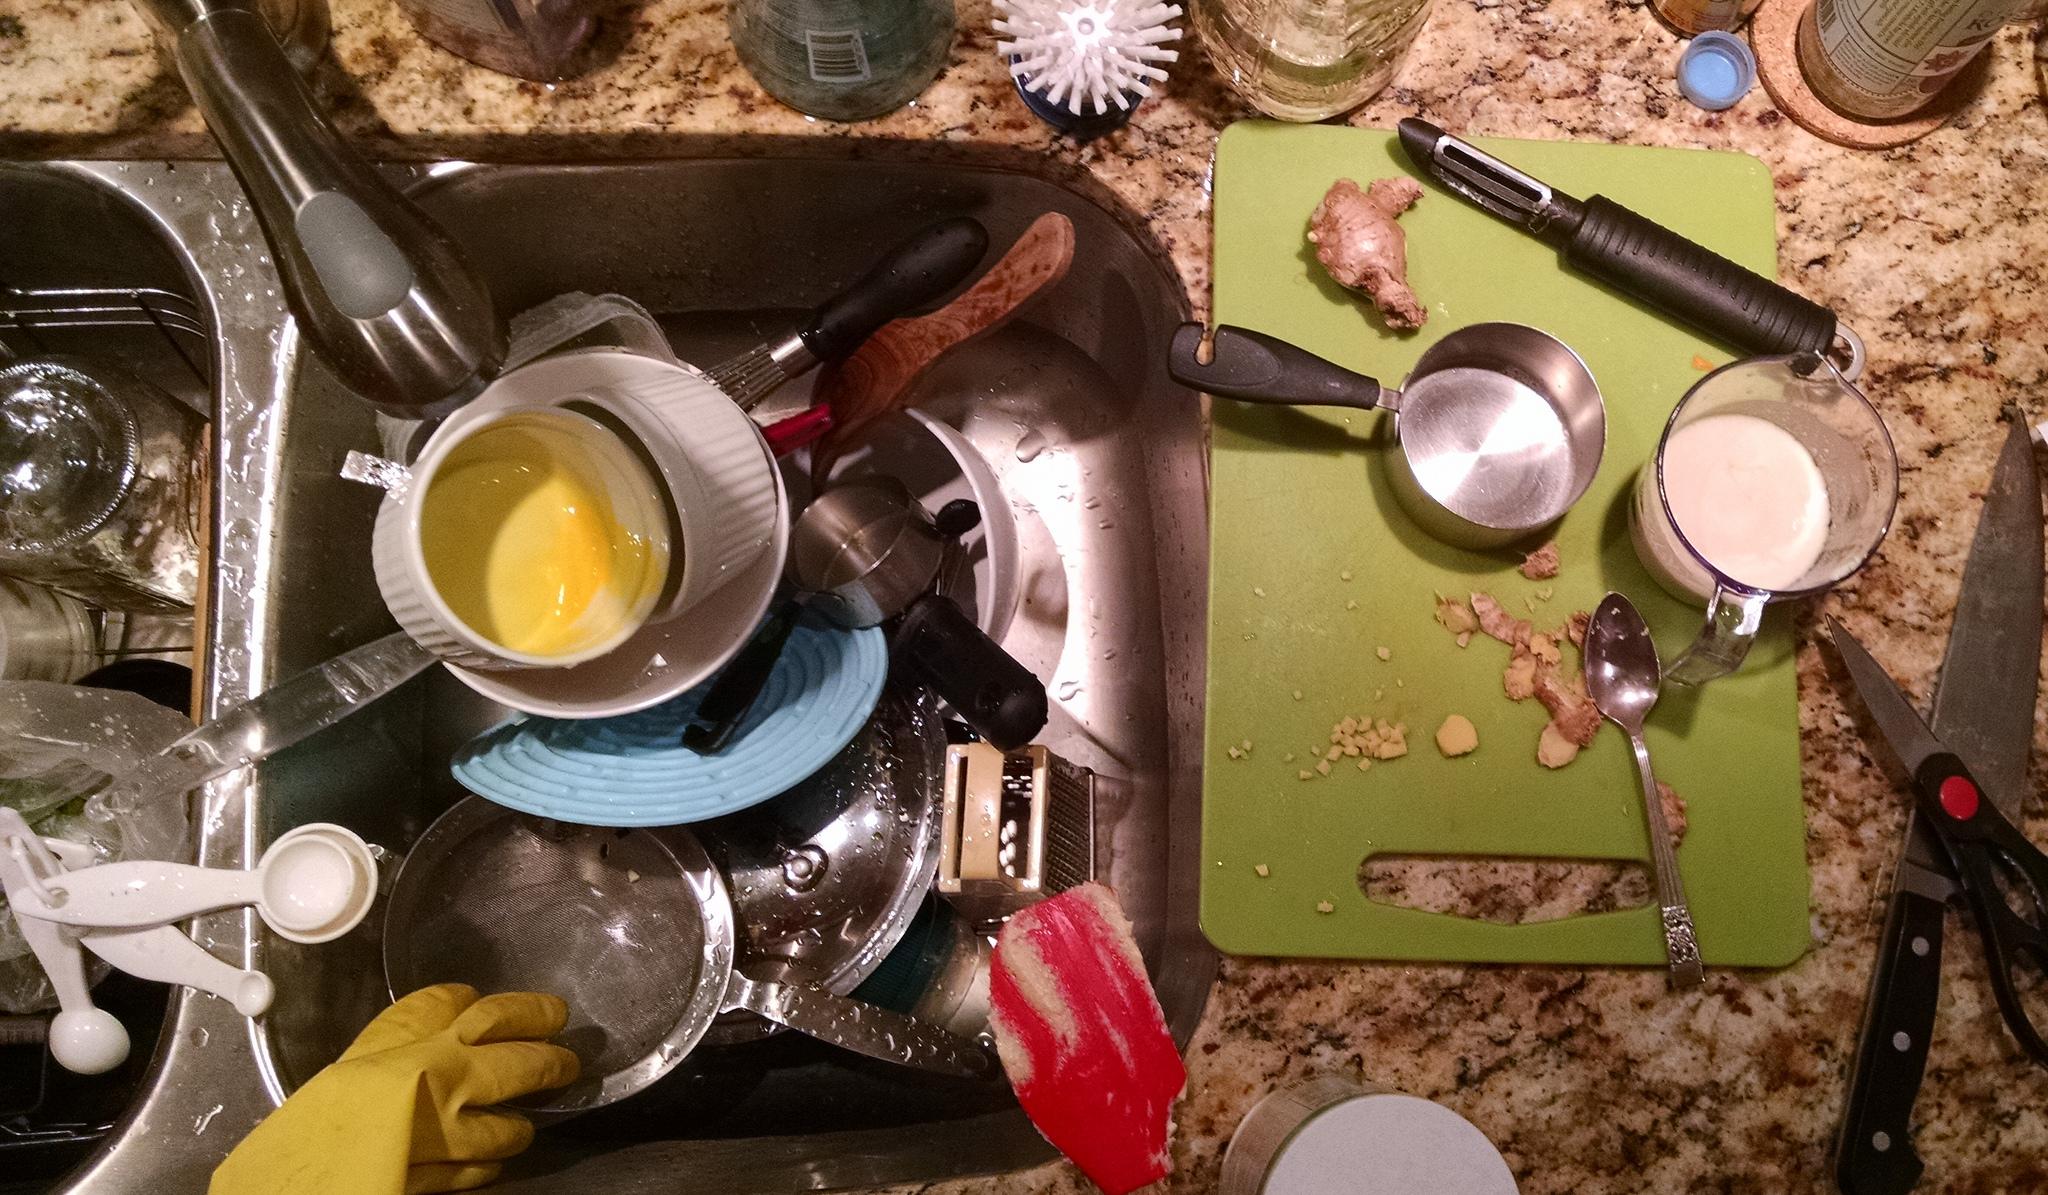 Technical Debt - Messy Kitchen